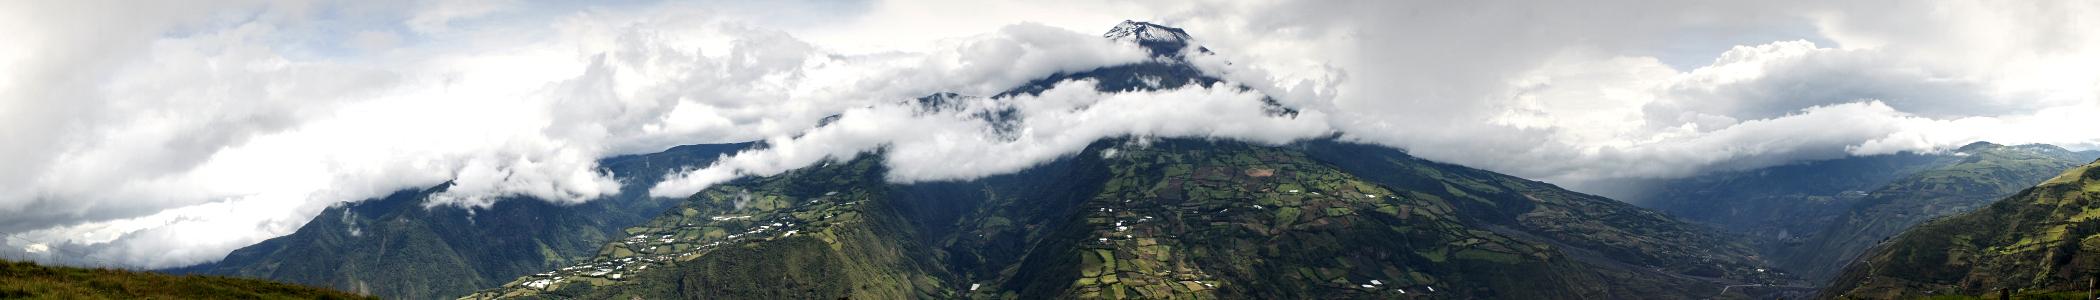 Andean Highlands Ecuador Travel Guide At Wikivoyage